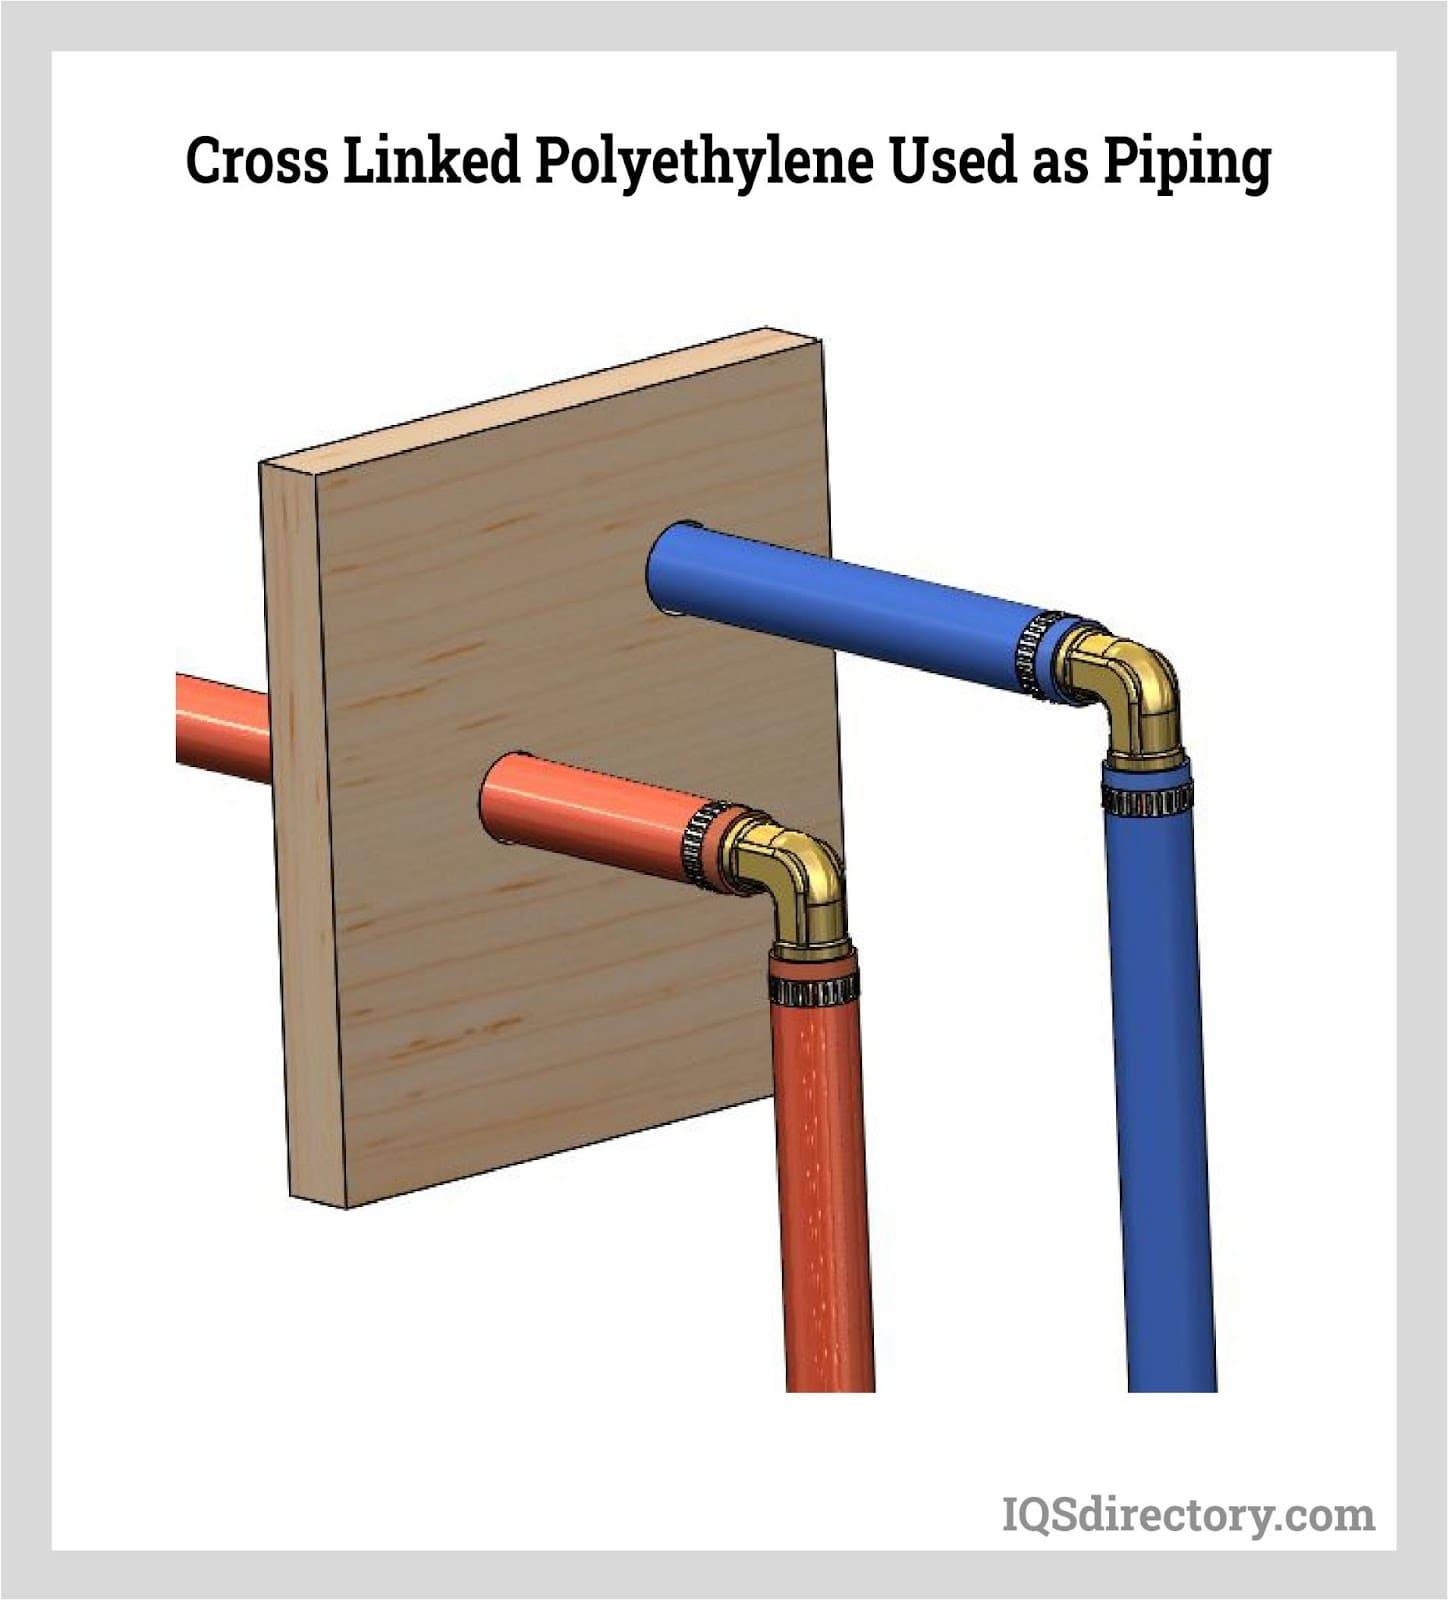 Cross Linked Polyethylene Used as Piping